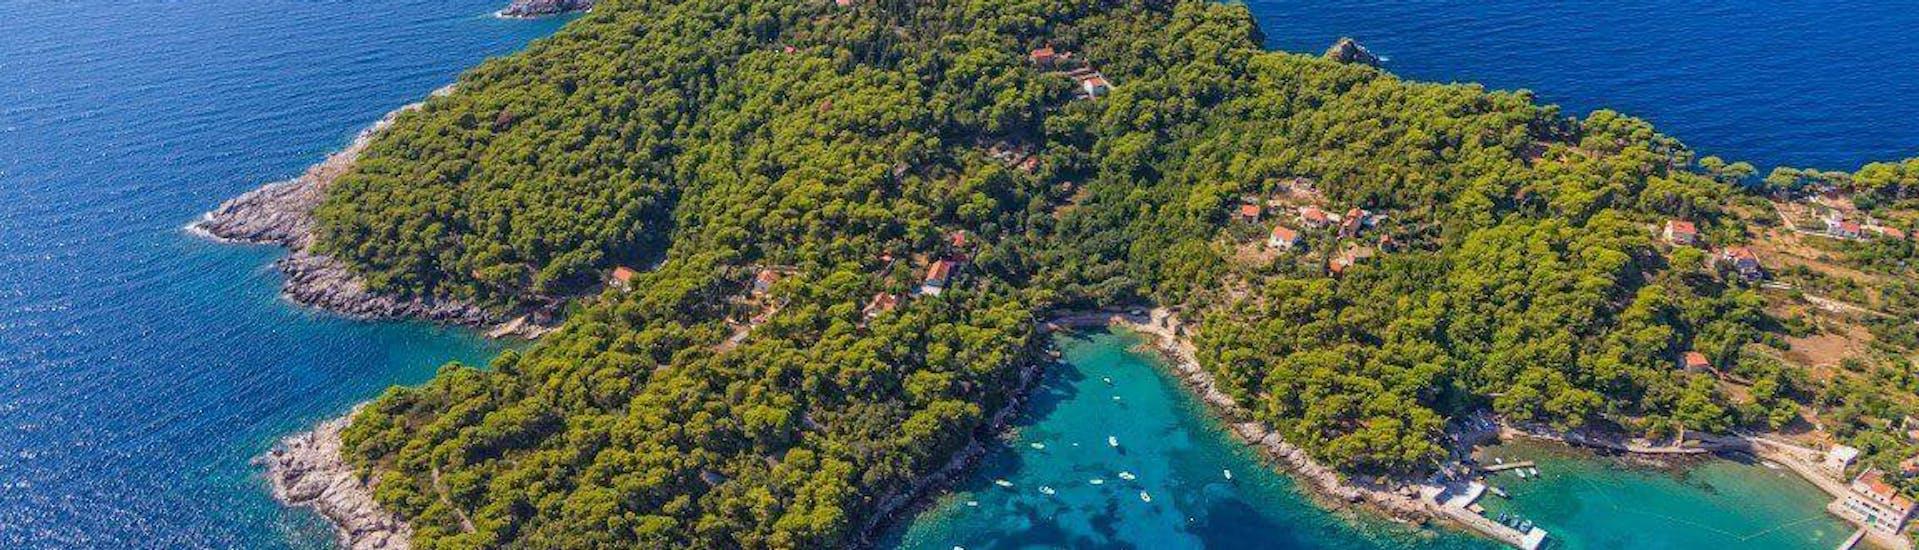 Private Boat Tour to Elaphiti Islands